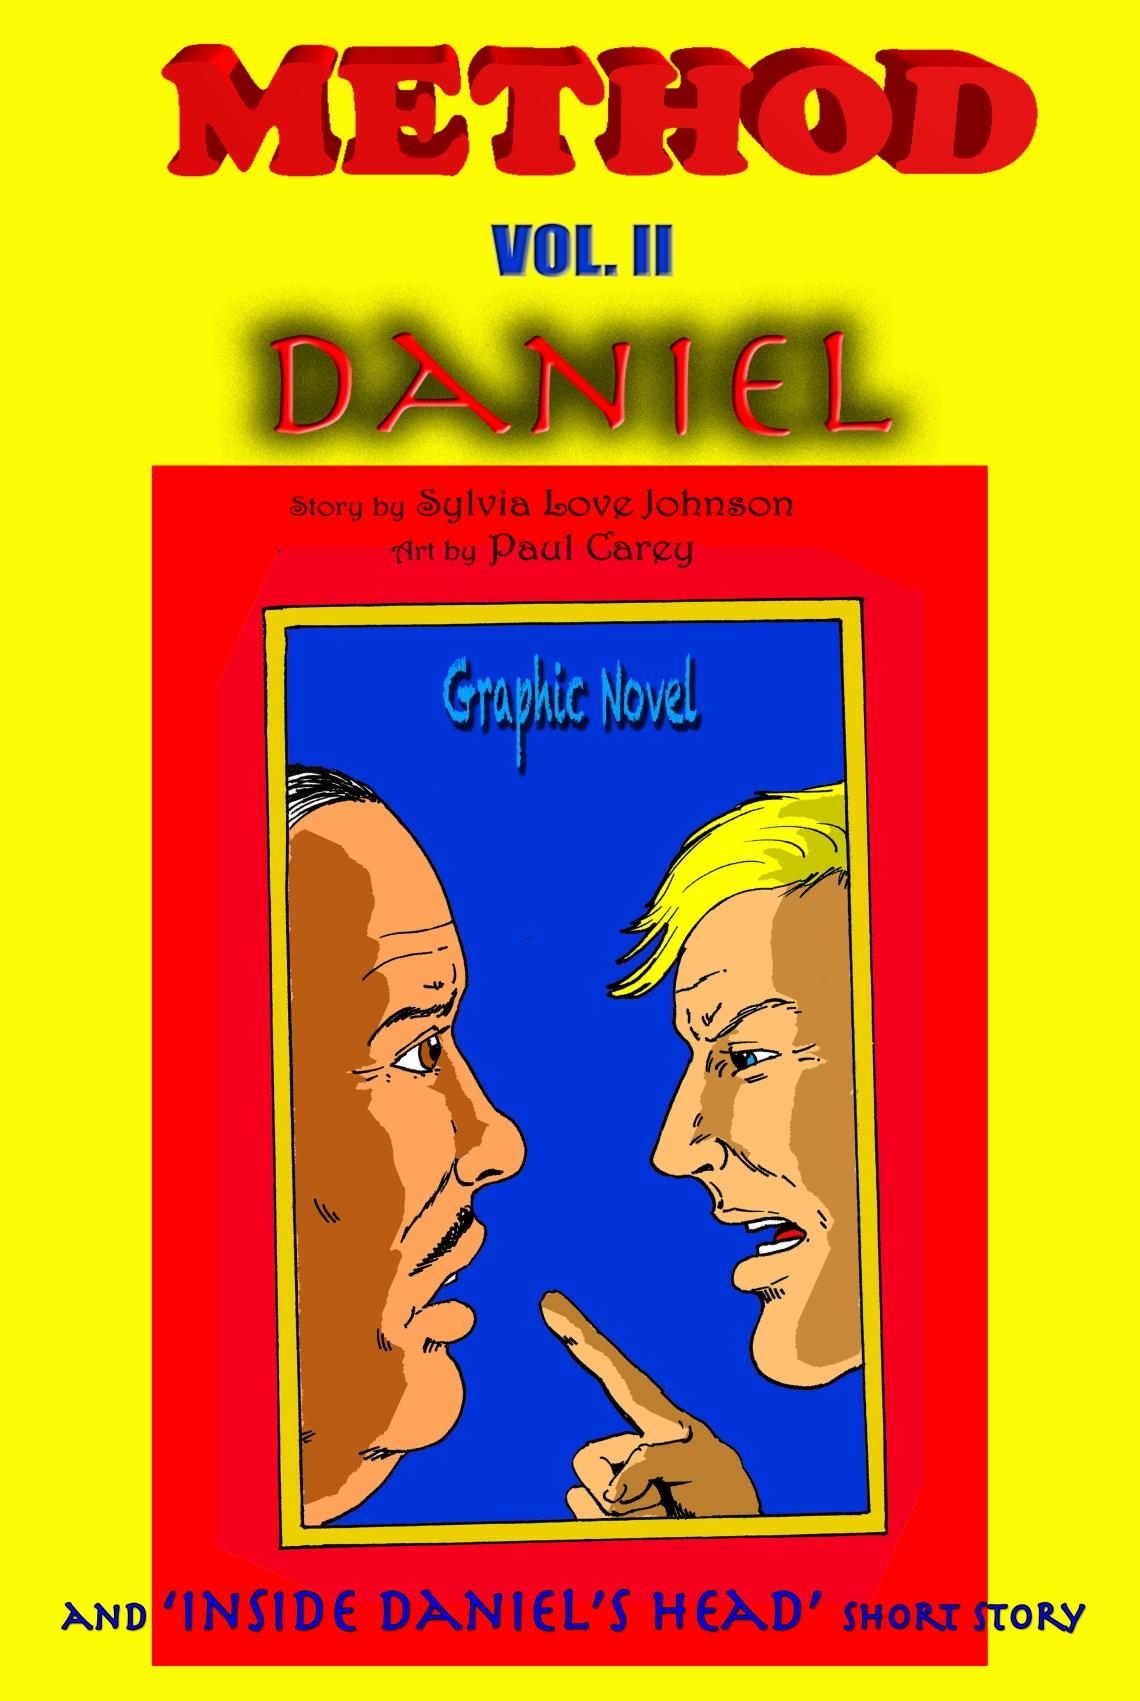 METHOD Vol. II Graphic Novel Series